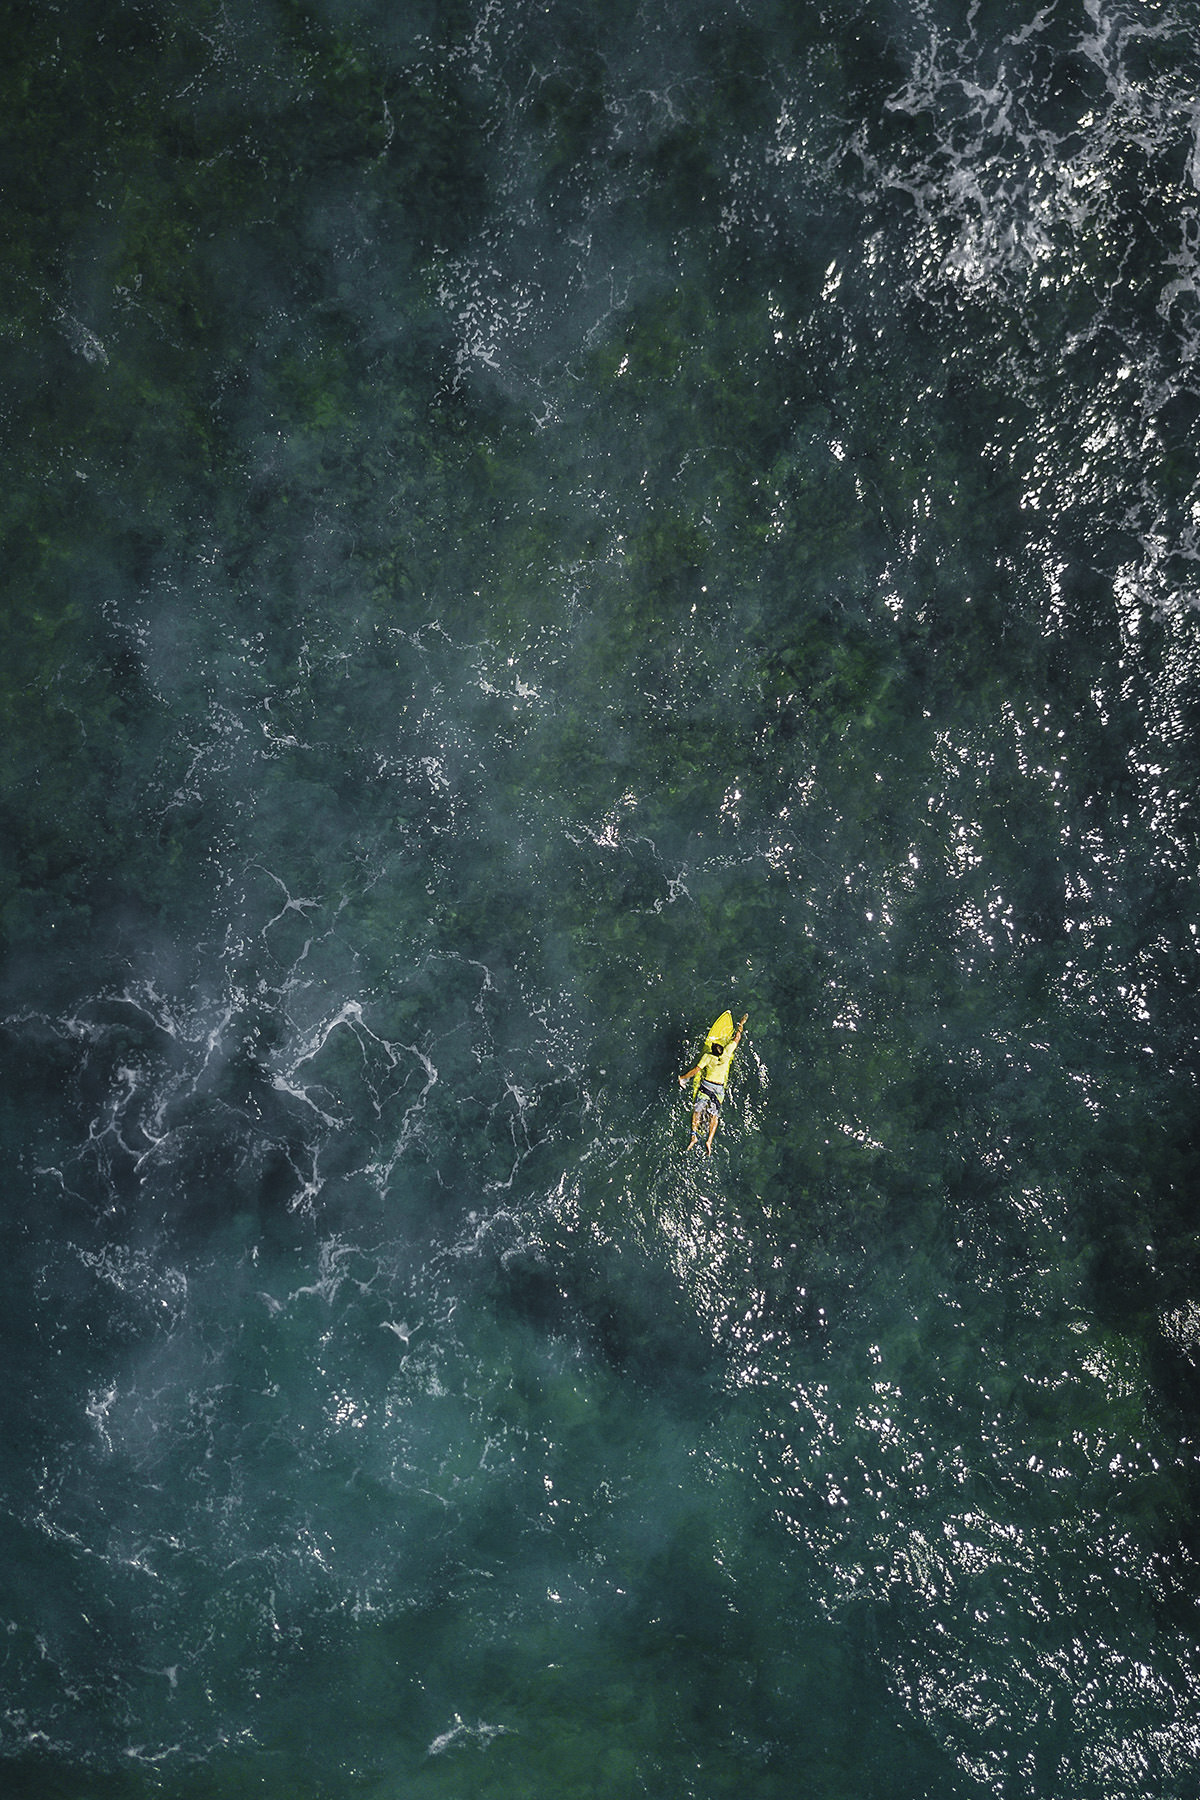 bali-surfing-uluwatu-travel-surfer-drone.jpg